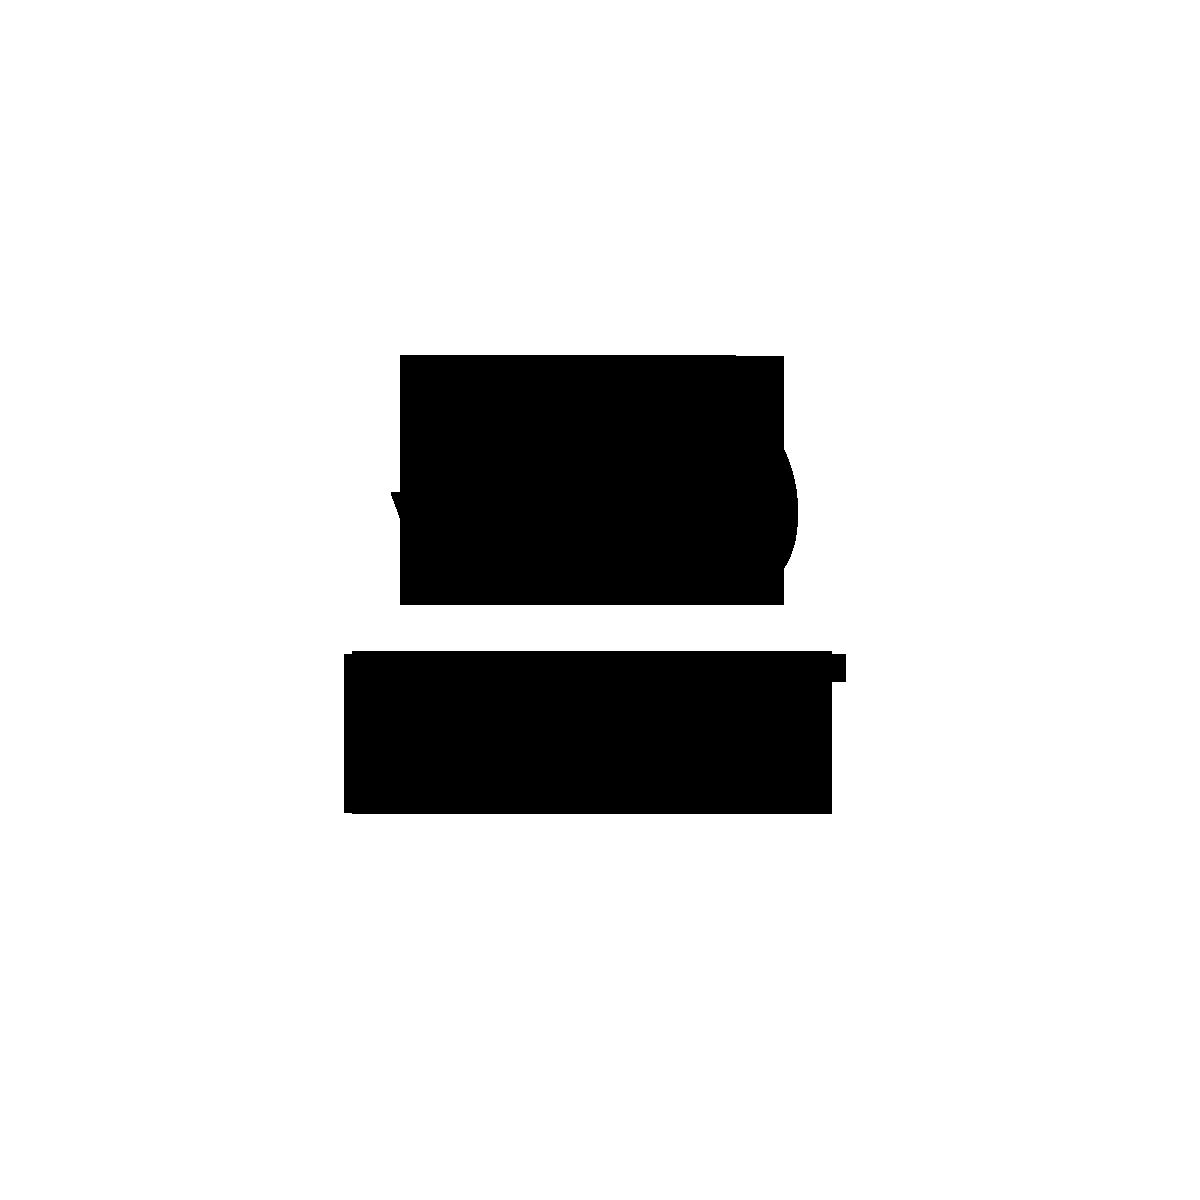 rabt-logo.png